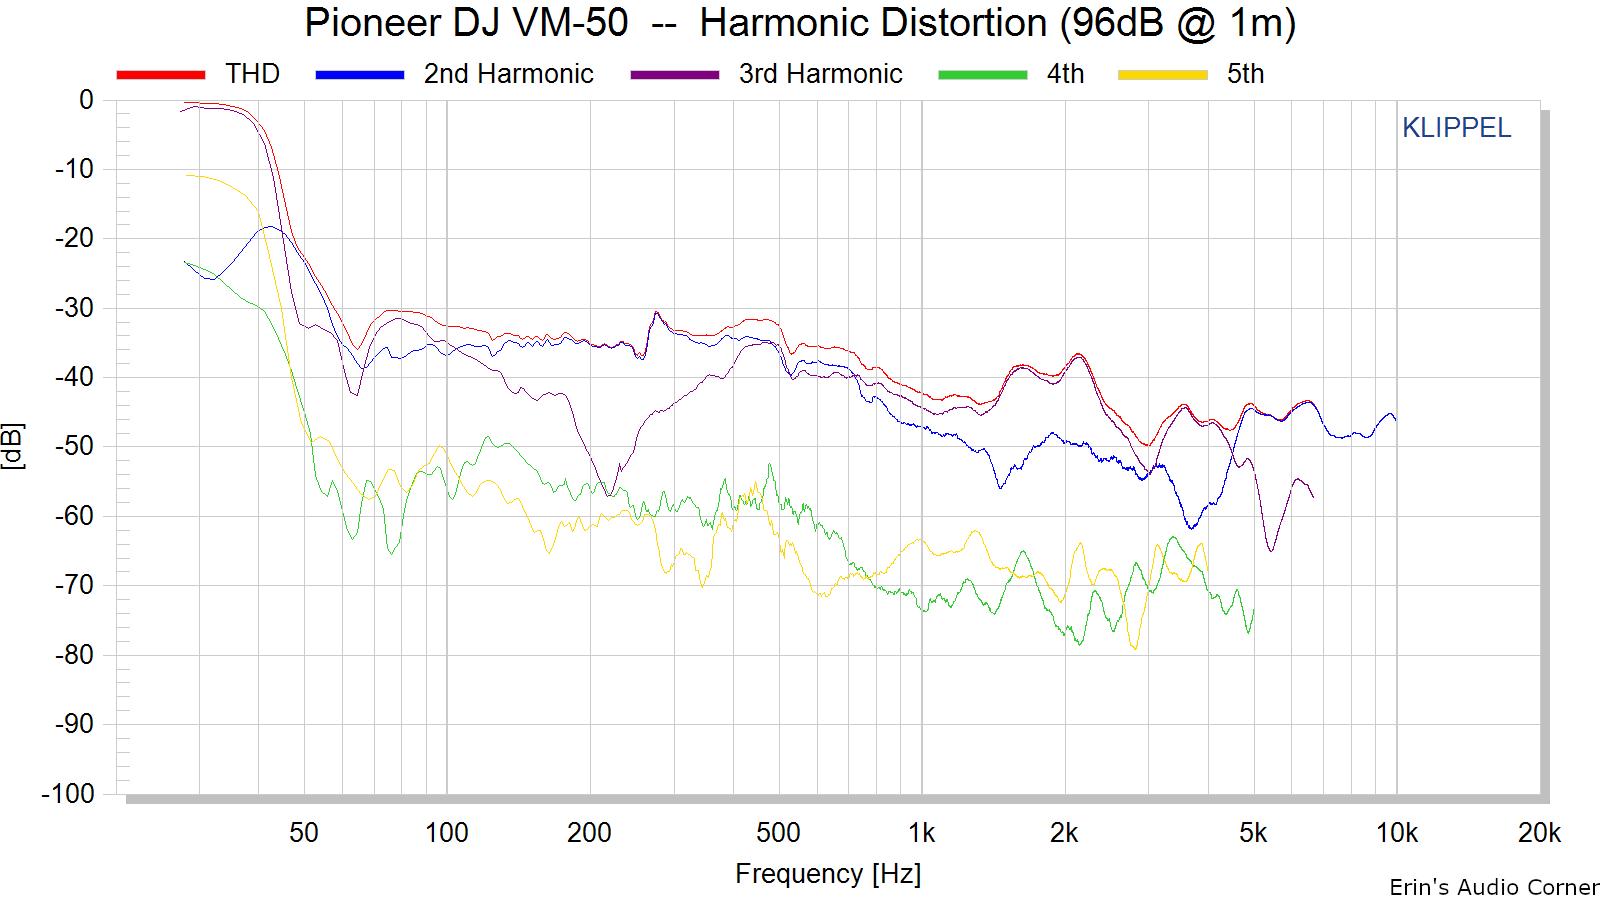 Pioneer%20DJ%20VM-50%20%20--%20%20Harmonic%20Distortion%20%2896dB%20%40%201m%29.png